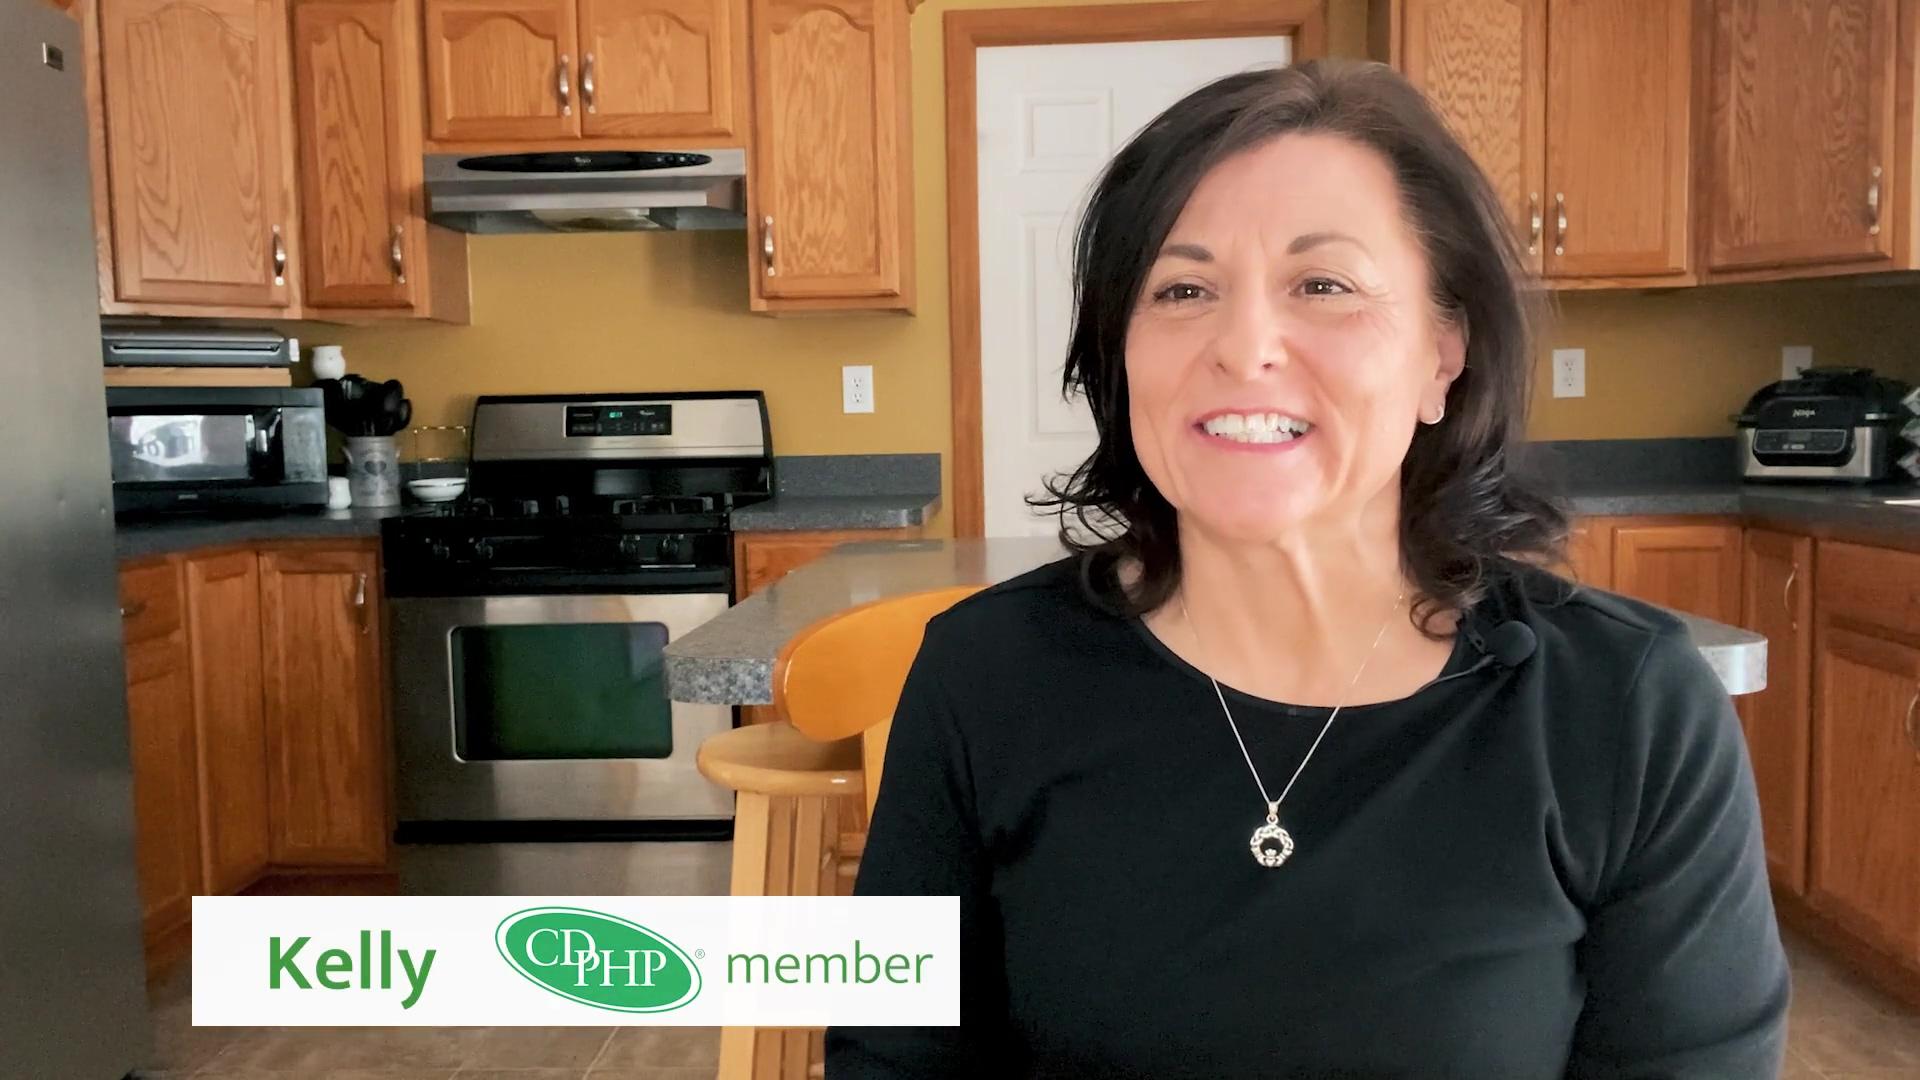 Foodsmart + CDPHP Kelly Fahrenkopf Case Study Video